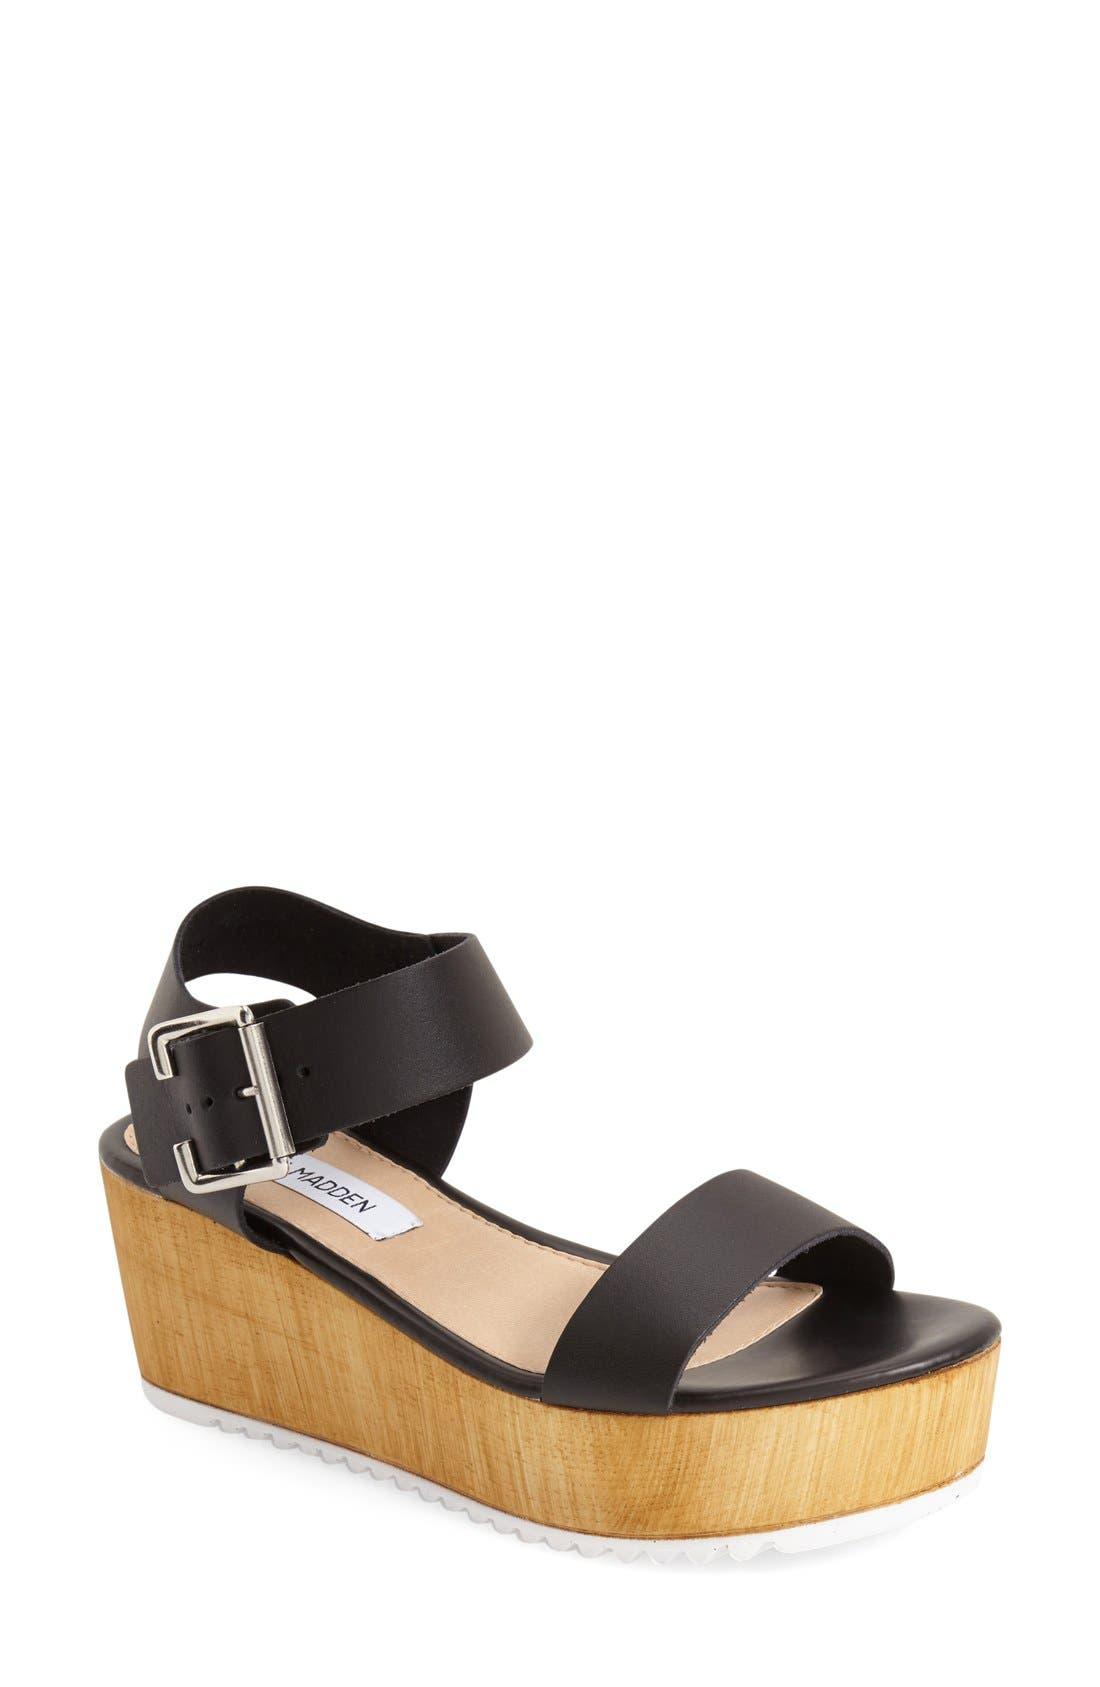 'Nylee' Platform Sandal,                             Main thumbnail 1, color,                             001